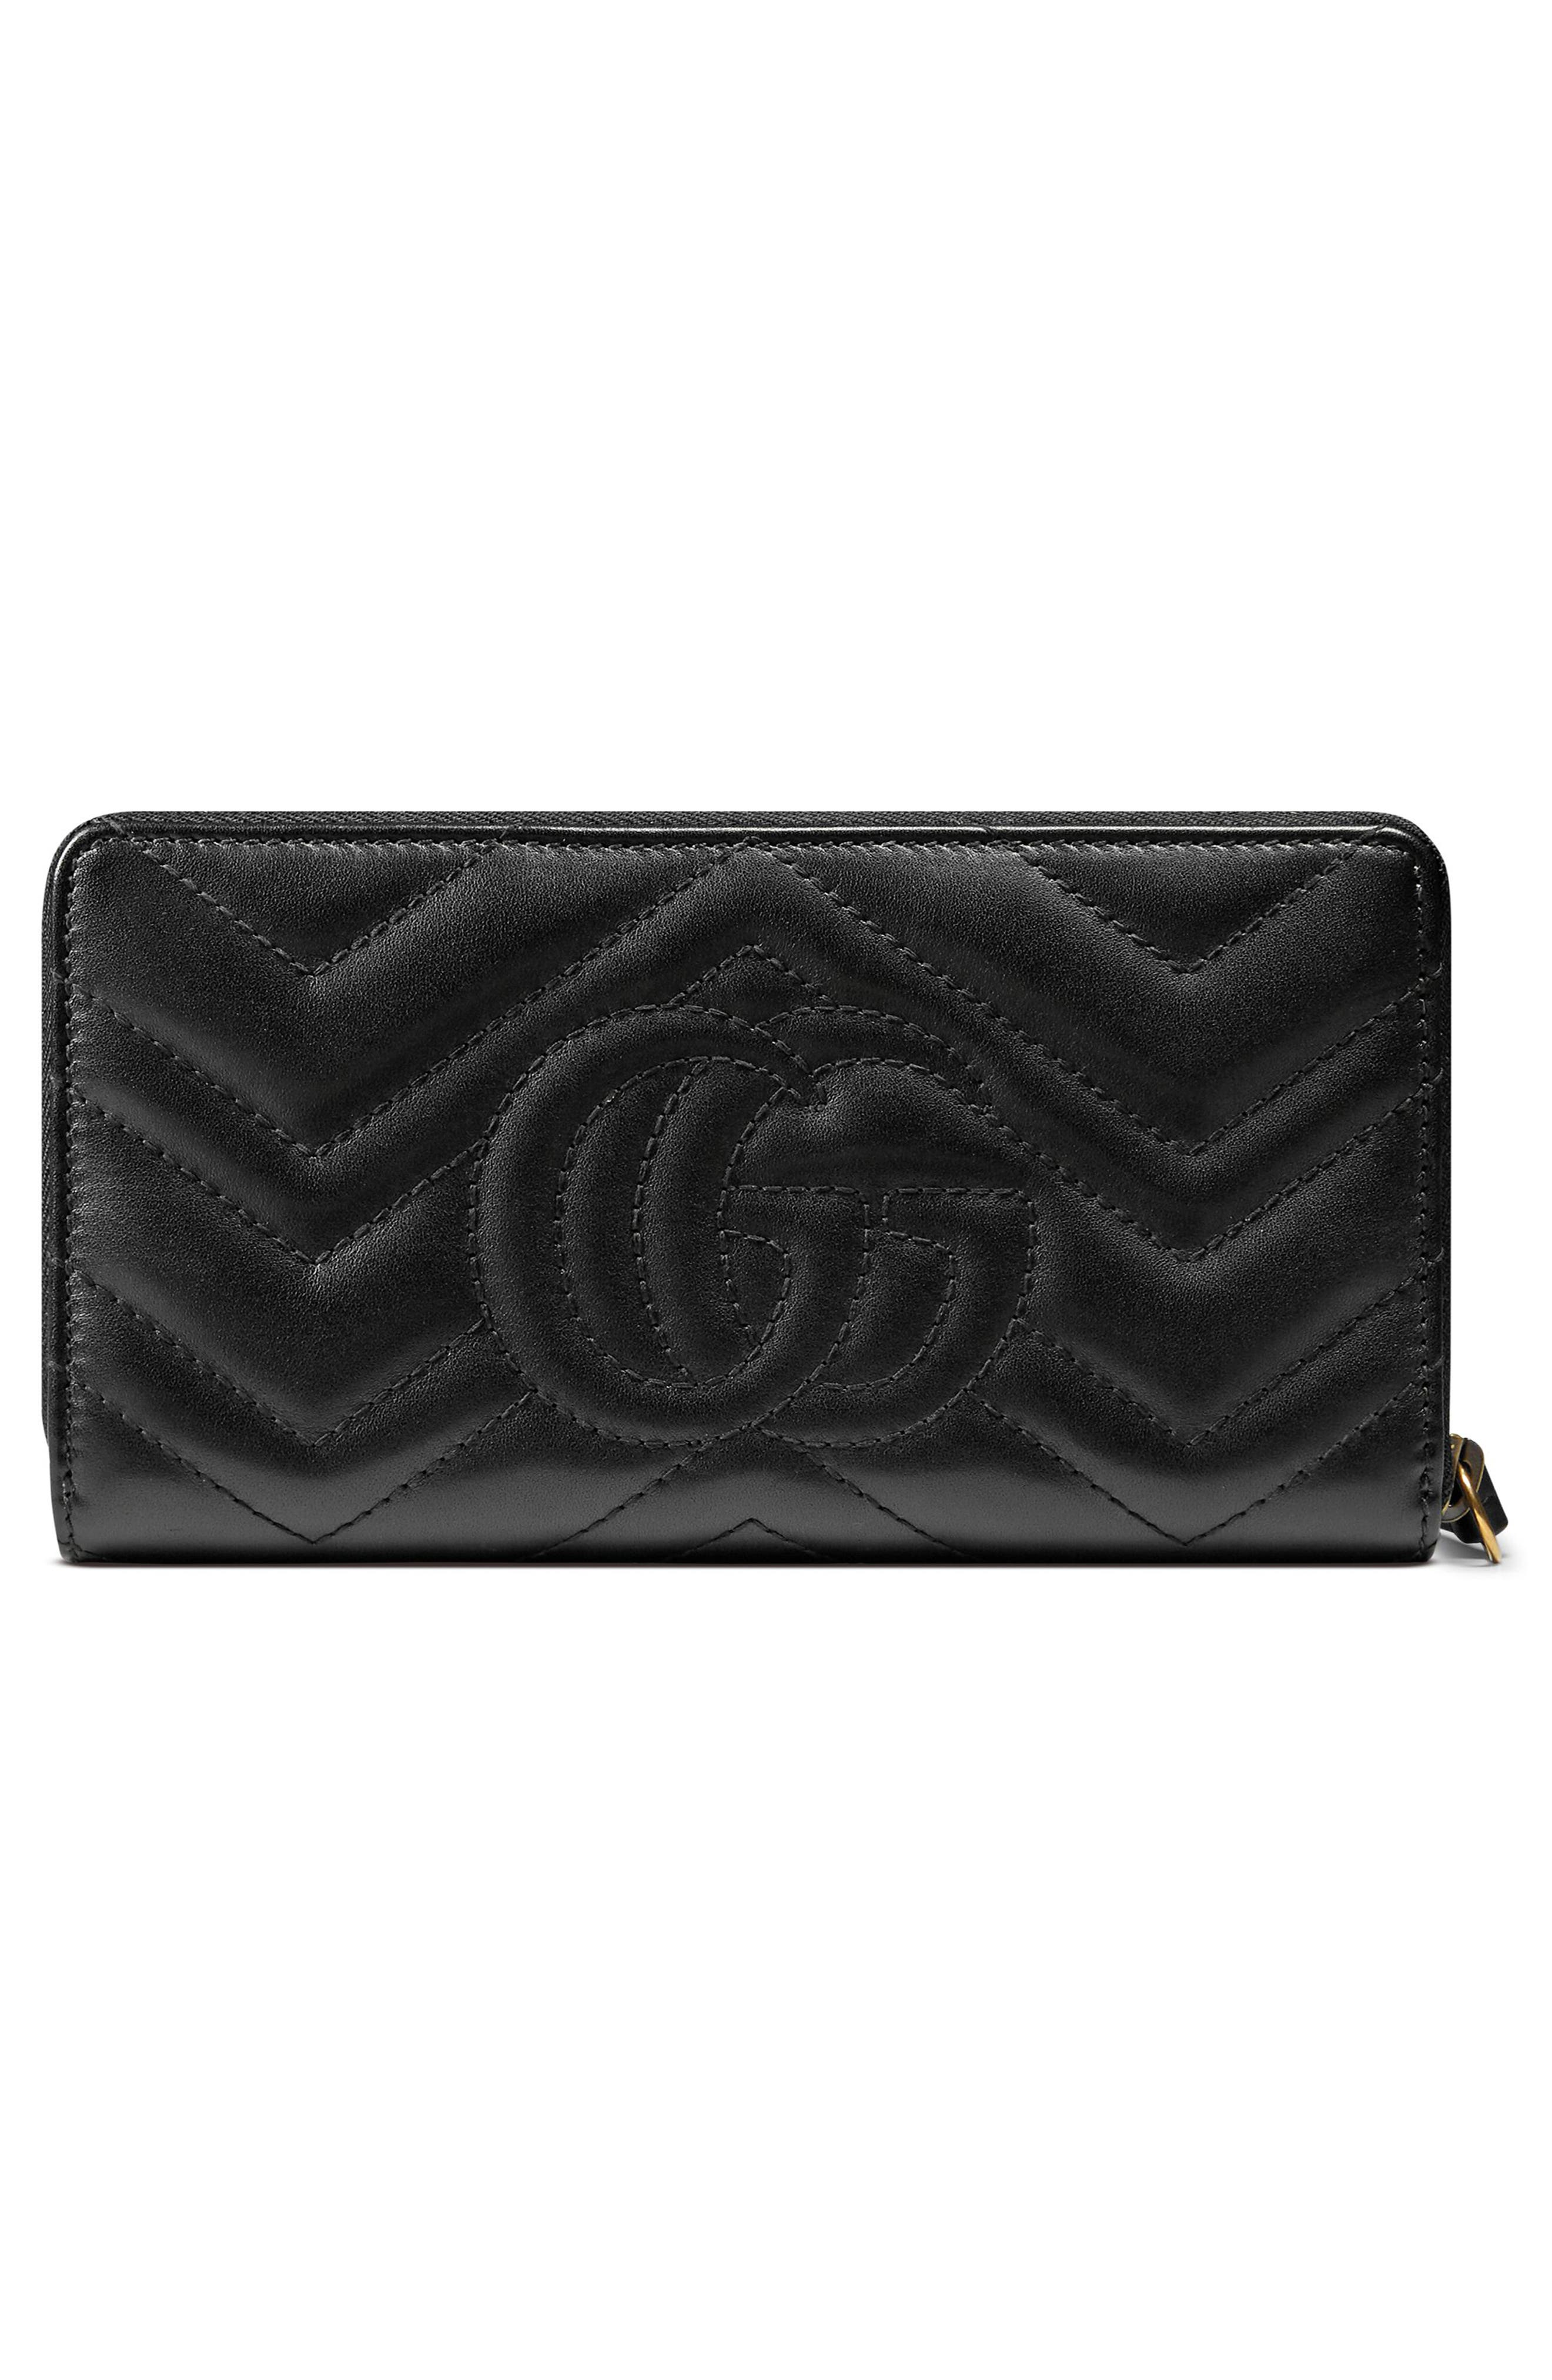 GUCCI, GG Marmont Matelassé Leather Zip-Around Wallet, Alternate thumbnail 3, color, NERO